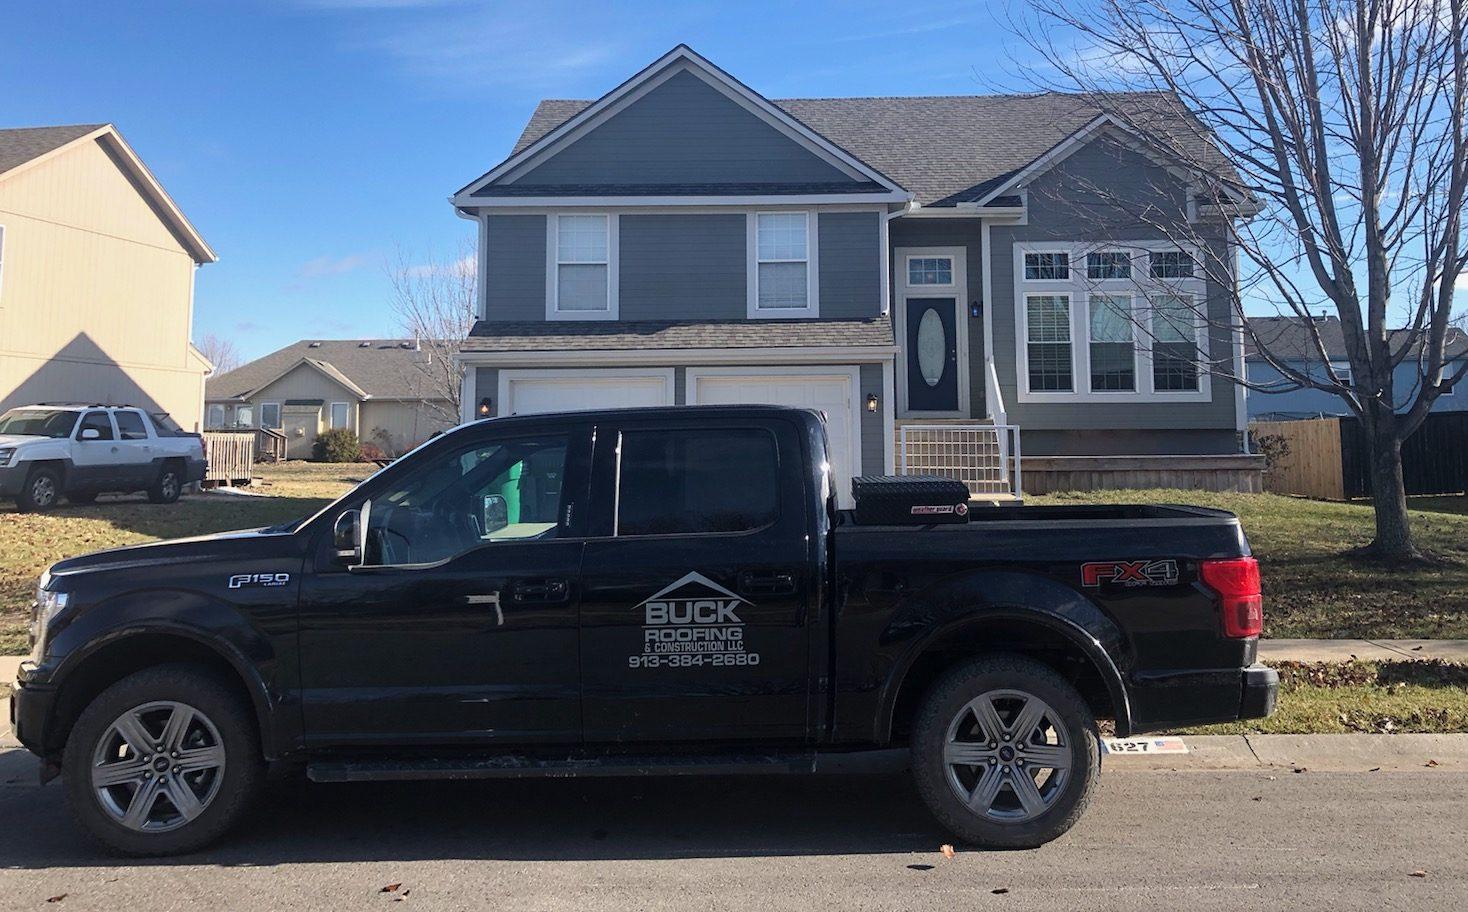 Buck Roofing - Residential Roofing Company - Kansas and Missouri - Certainteed Landmark - Weathered Wood